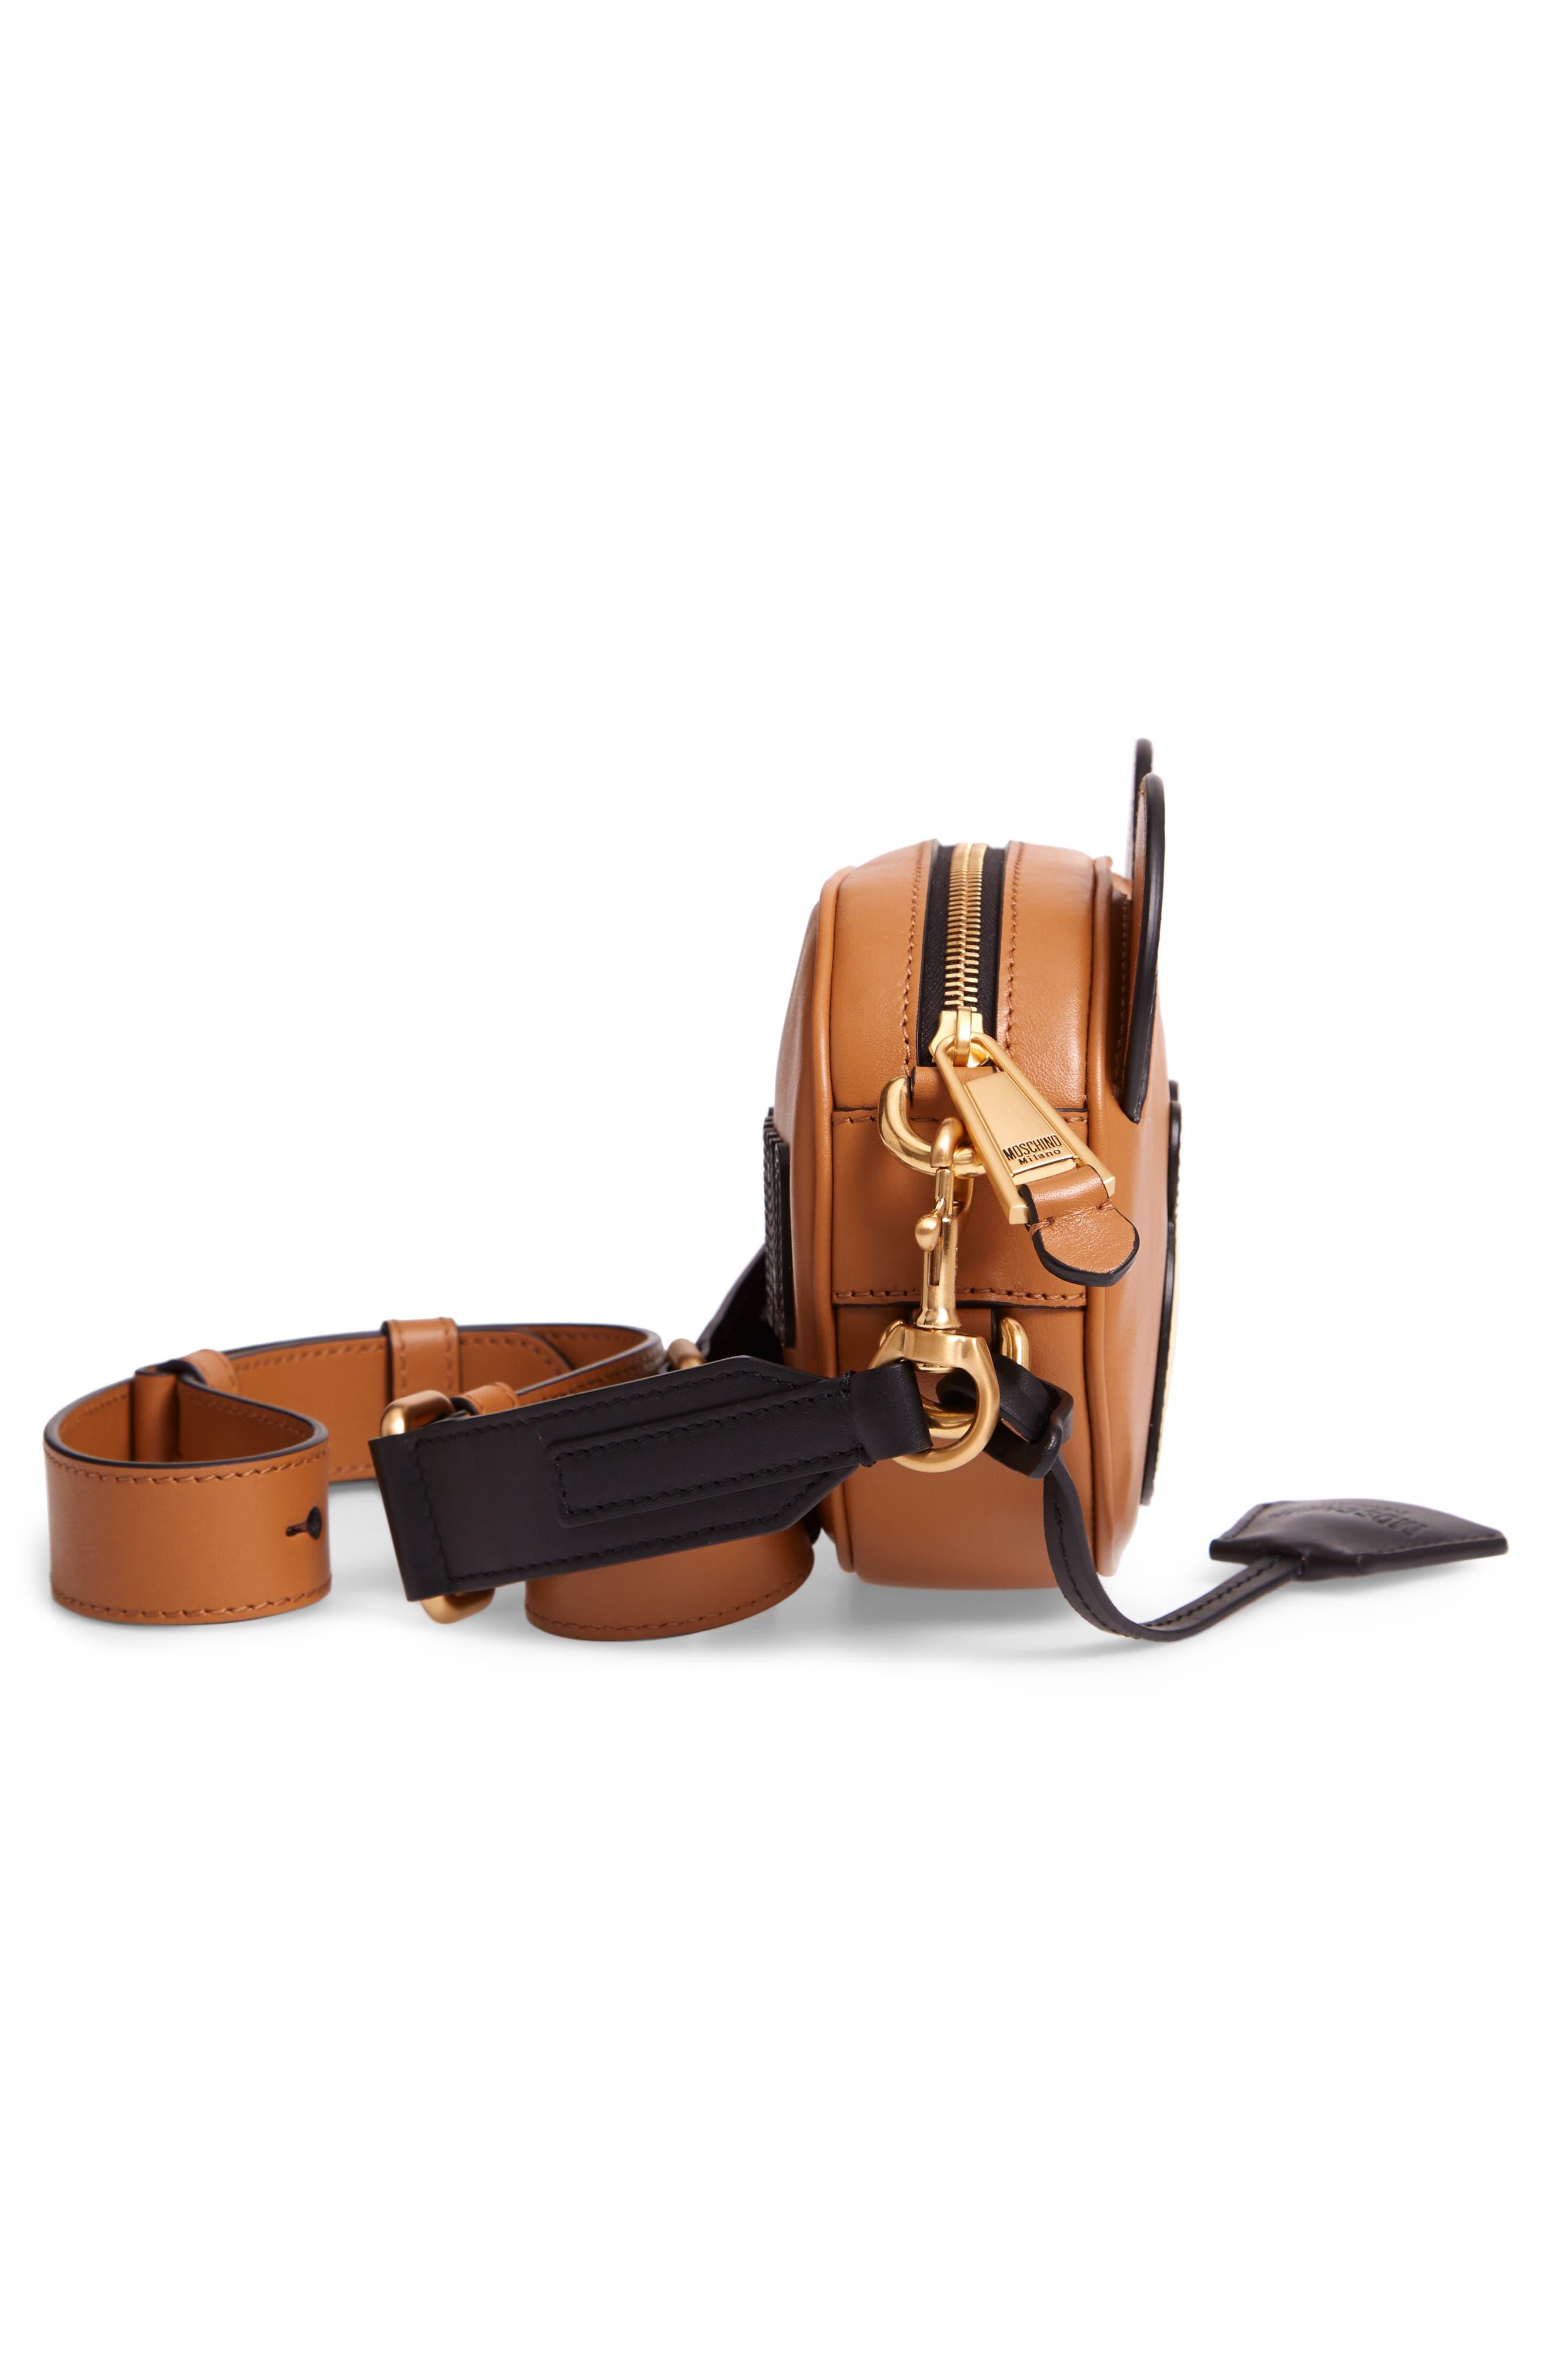 Crystal Teddy Leather Crossbody Bag,                             Alternate thumbnail 5, color,                             BROWN